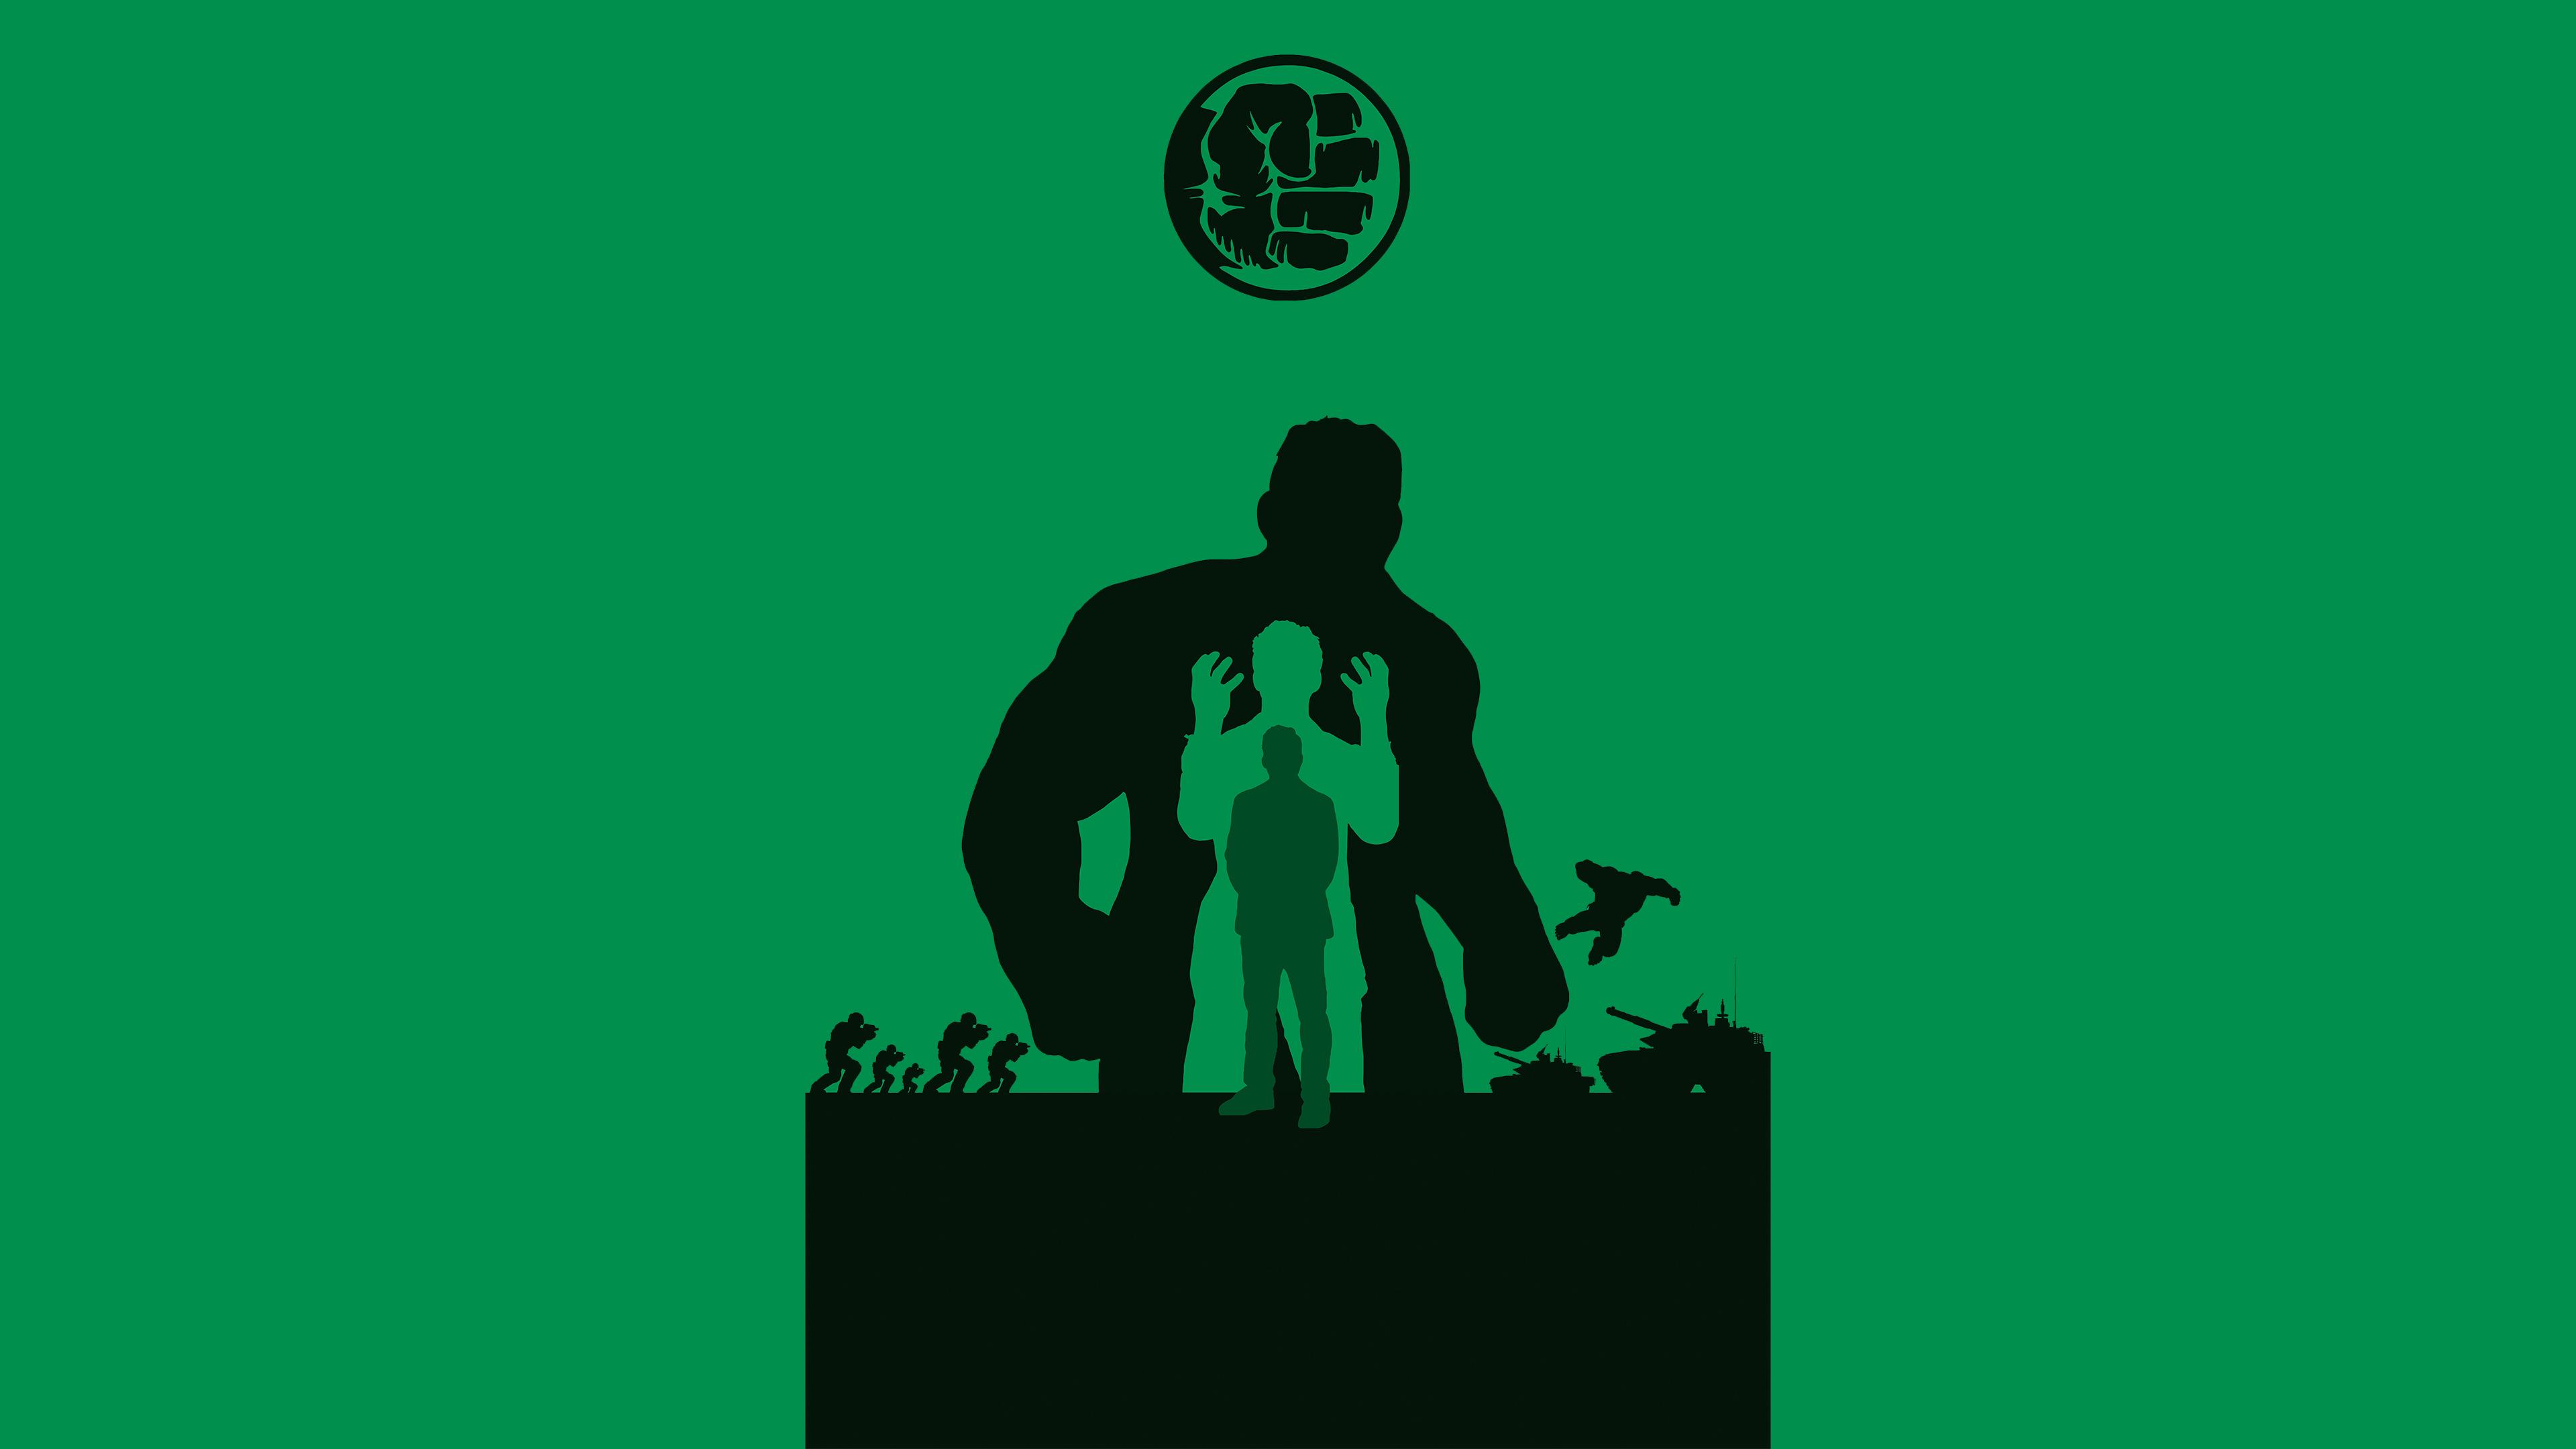 hulk avengers endgame 4k minimalism 1560533655 - Hulk Avengers Endgame 4k Minimalism - superheroes wallpapers, hulk wallpapers, hd-wallpapers, behance wallpapers, avengers endgame wallpapers, artwork wallpapers, 4k-wallpapers